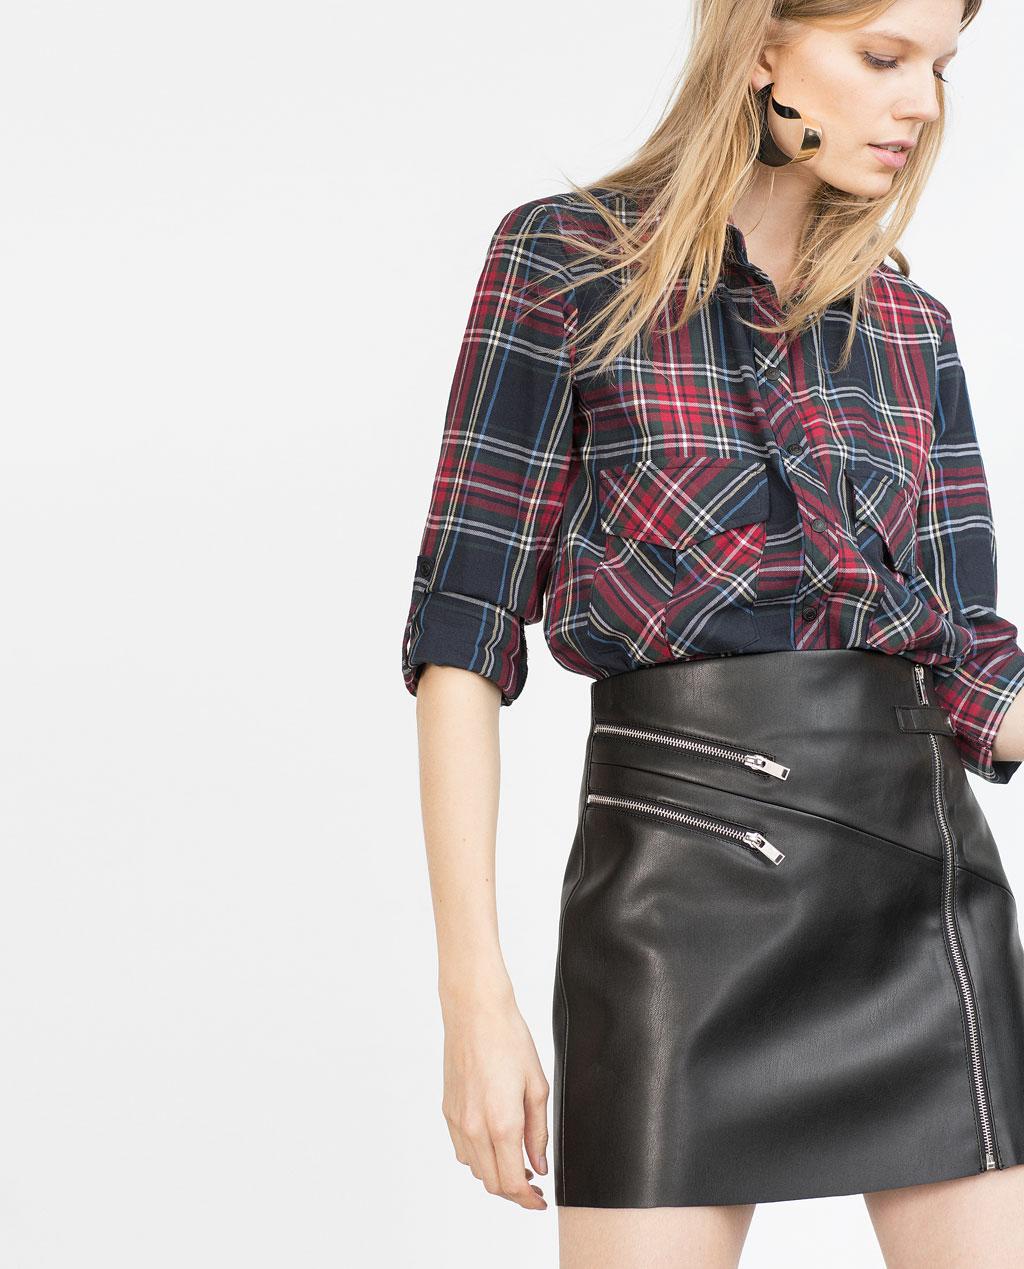 timeless design 8206e 953f4 Zara Pelle Con In Online EstateModa Stile Gonna Primavera ...